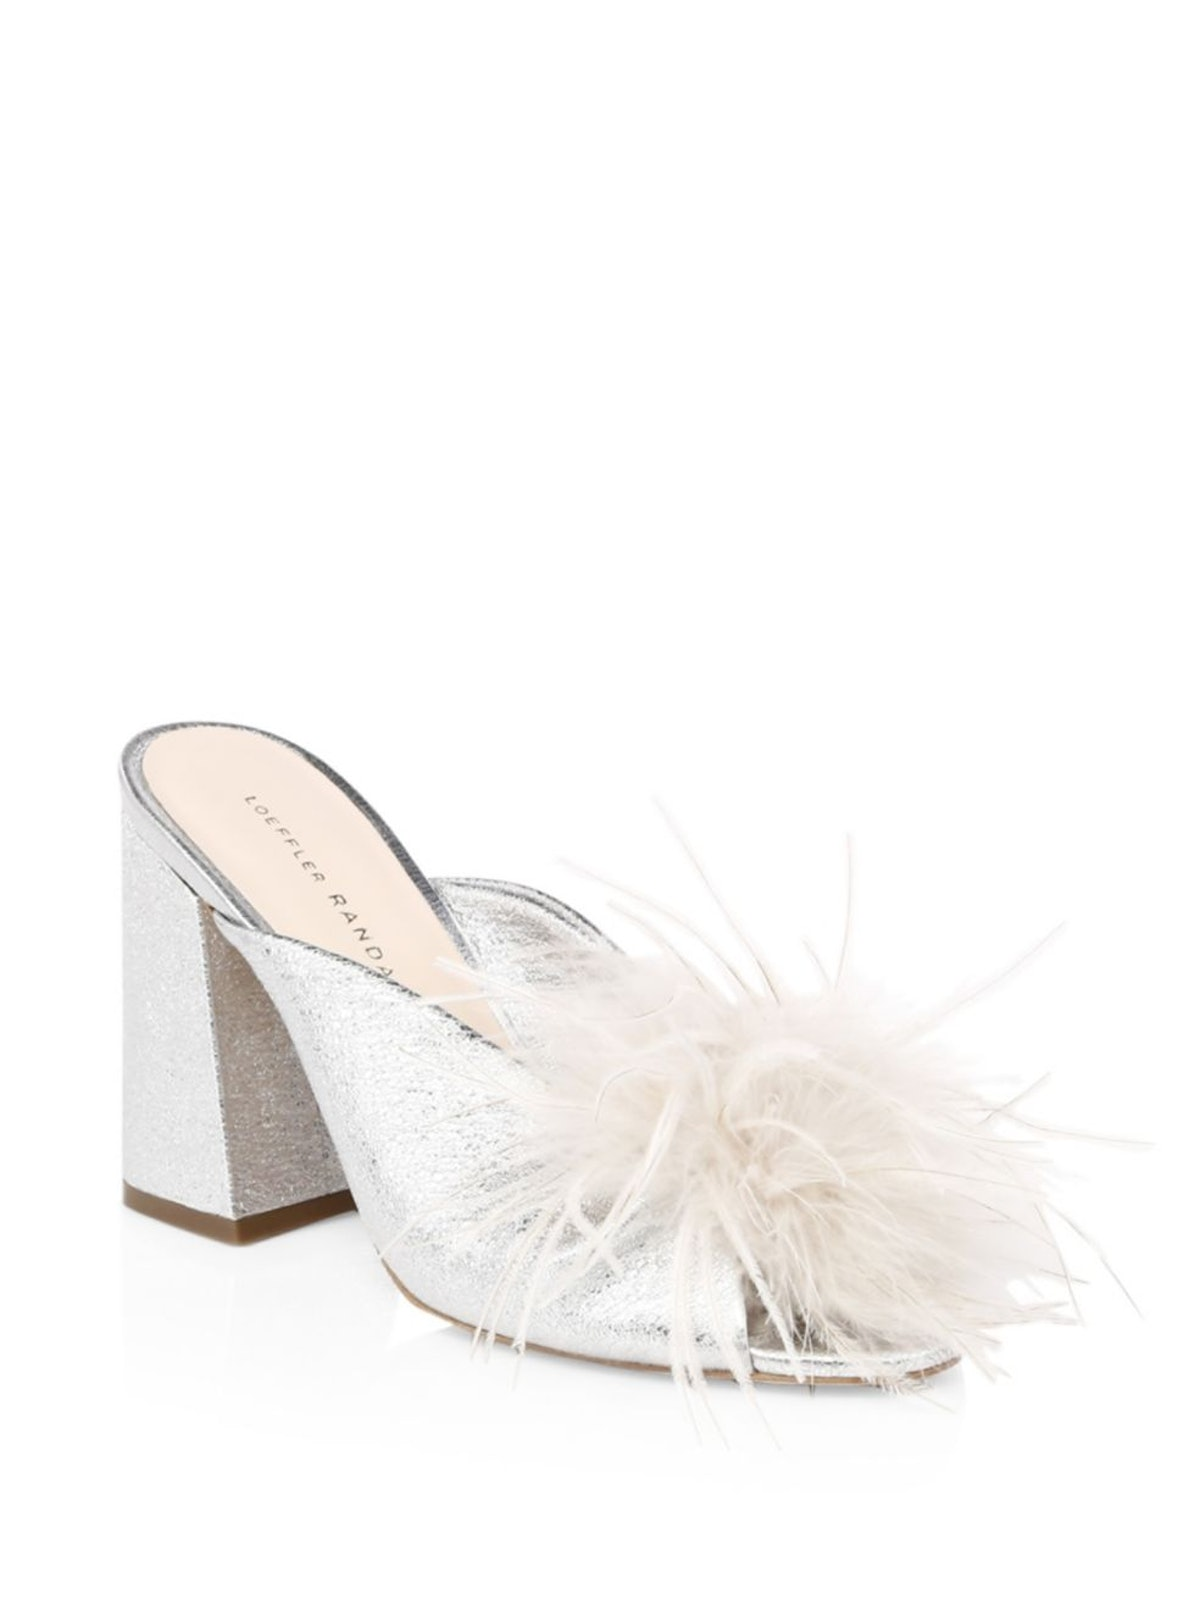 Loeffler Randall Laurel Ostritch Feather Leather Sandals